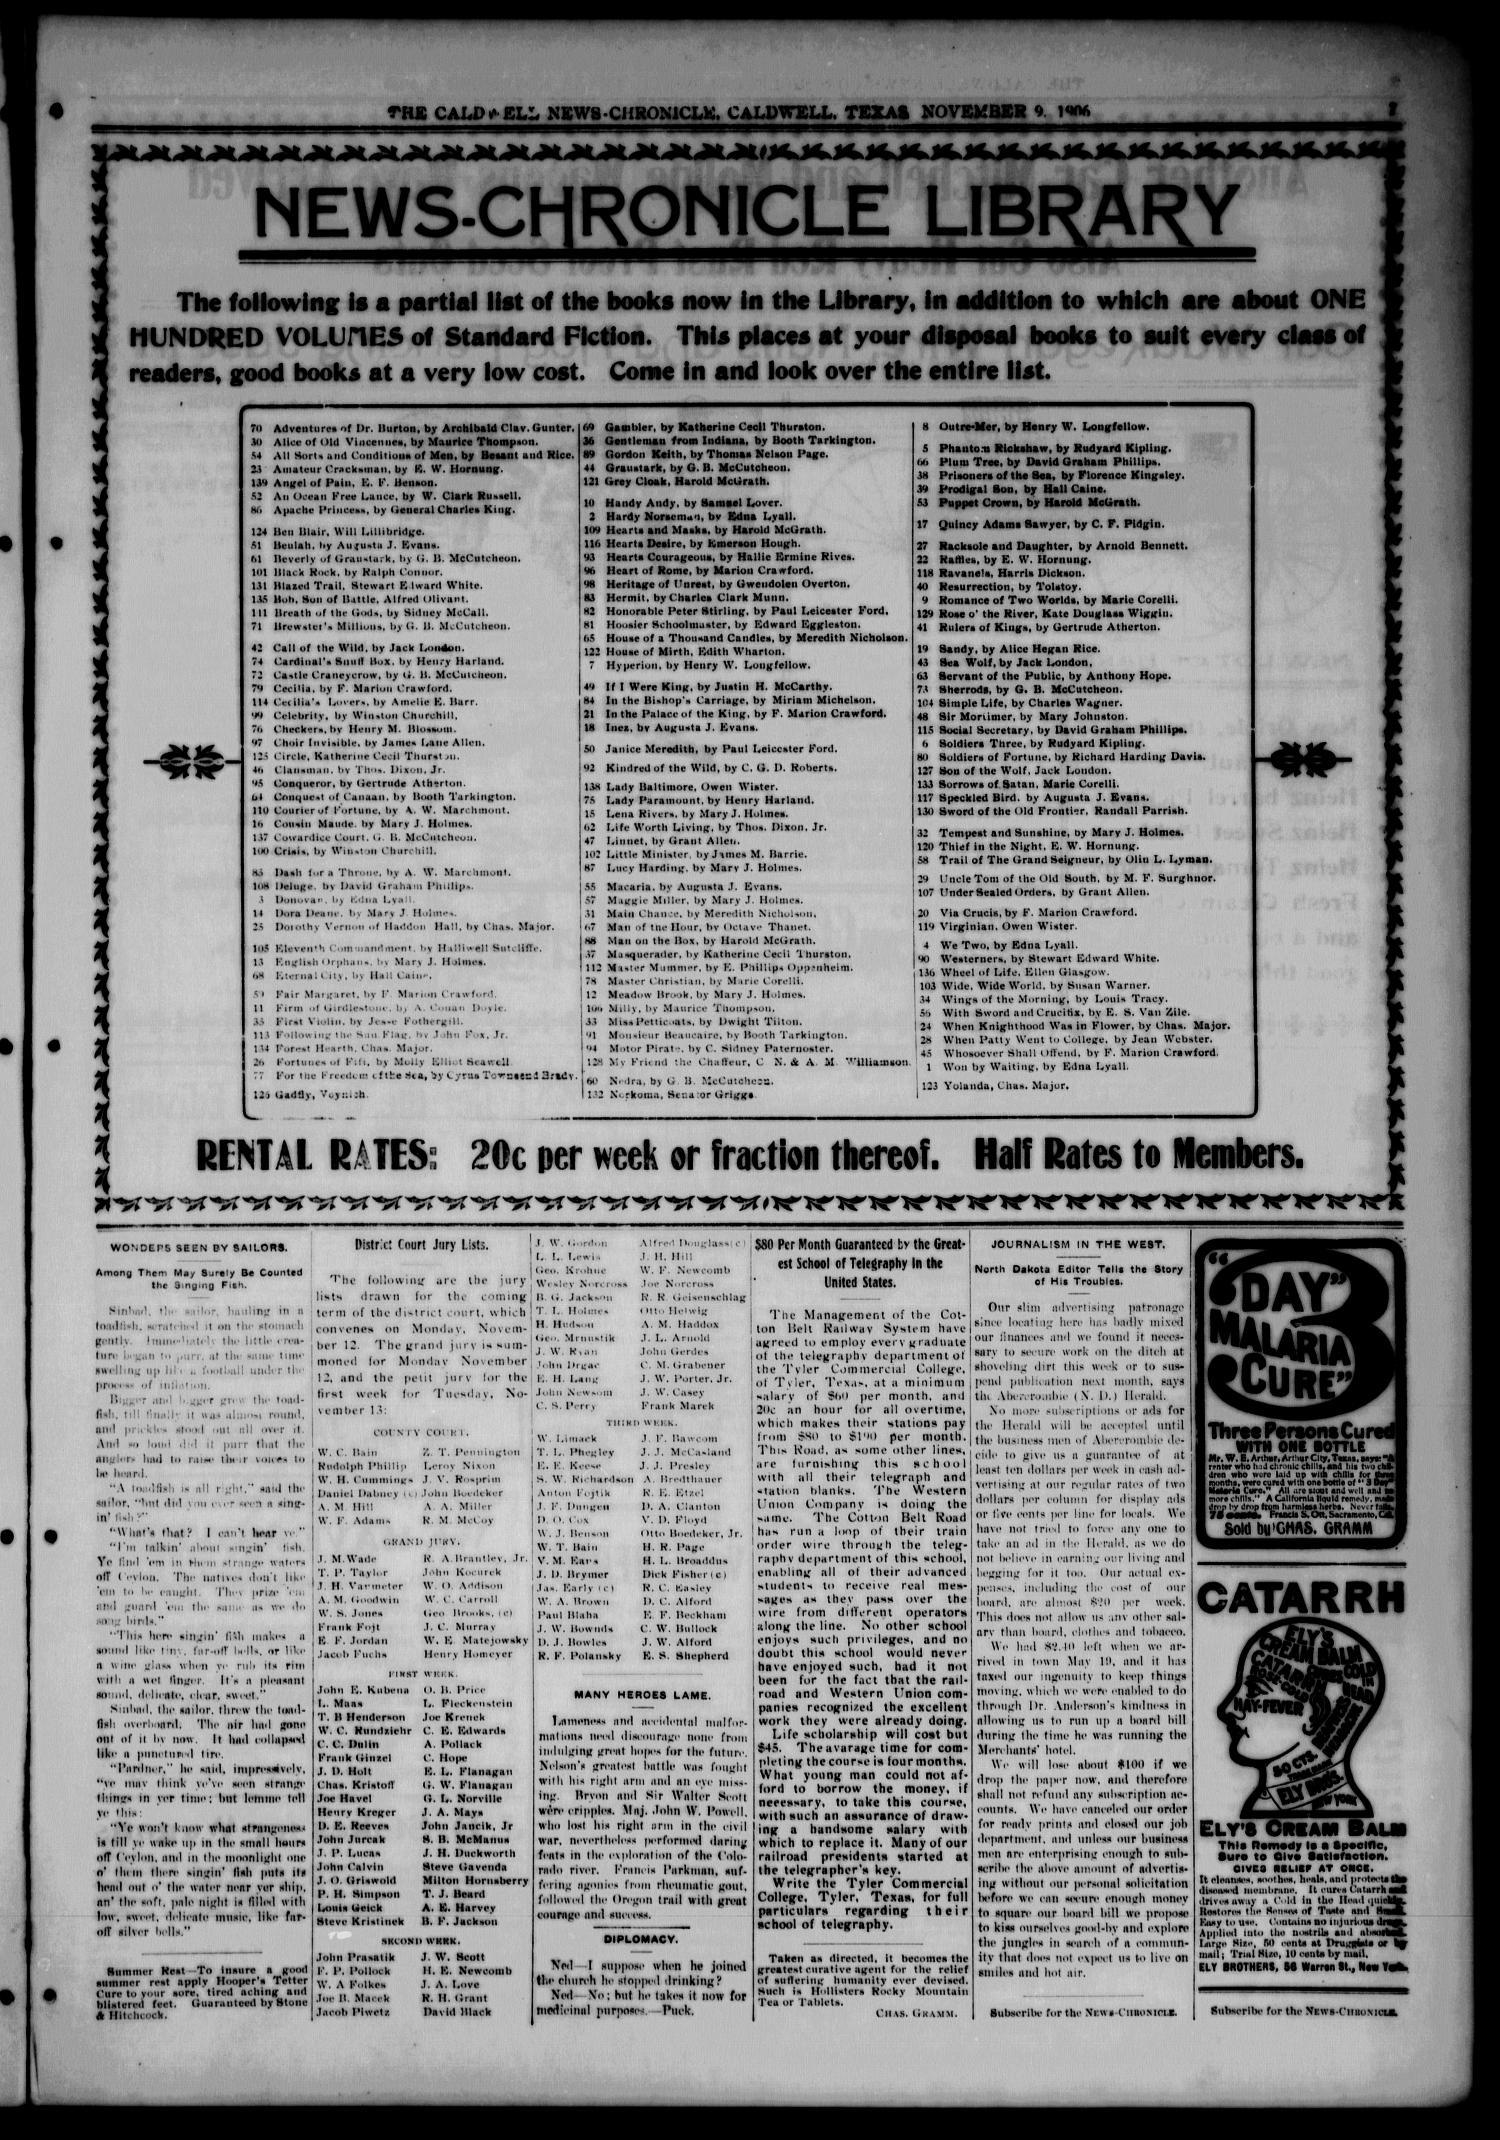 Caldwell News-Chronicle  (Caldwell, Tex ), Vol  27, No  25